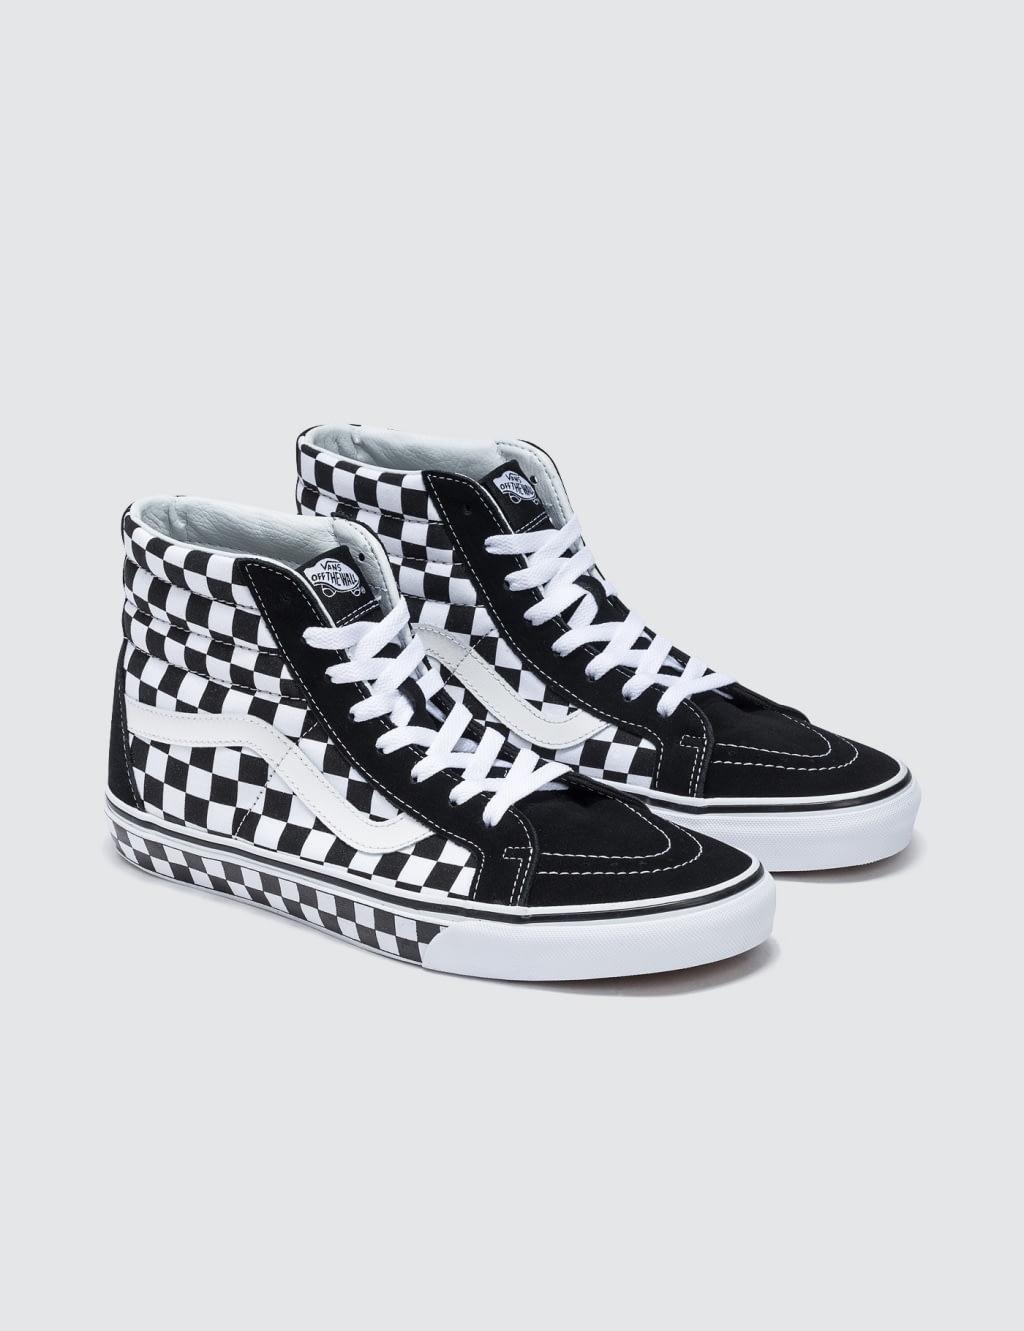 vans sk8 hi checkerboard reissue